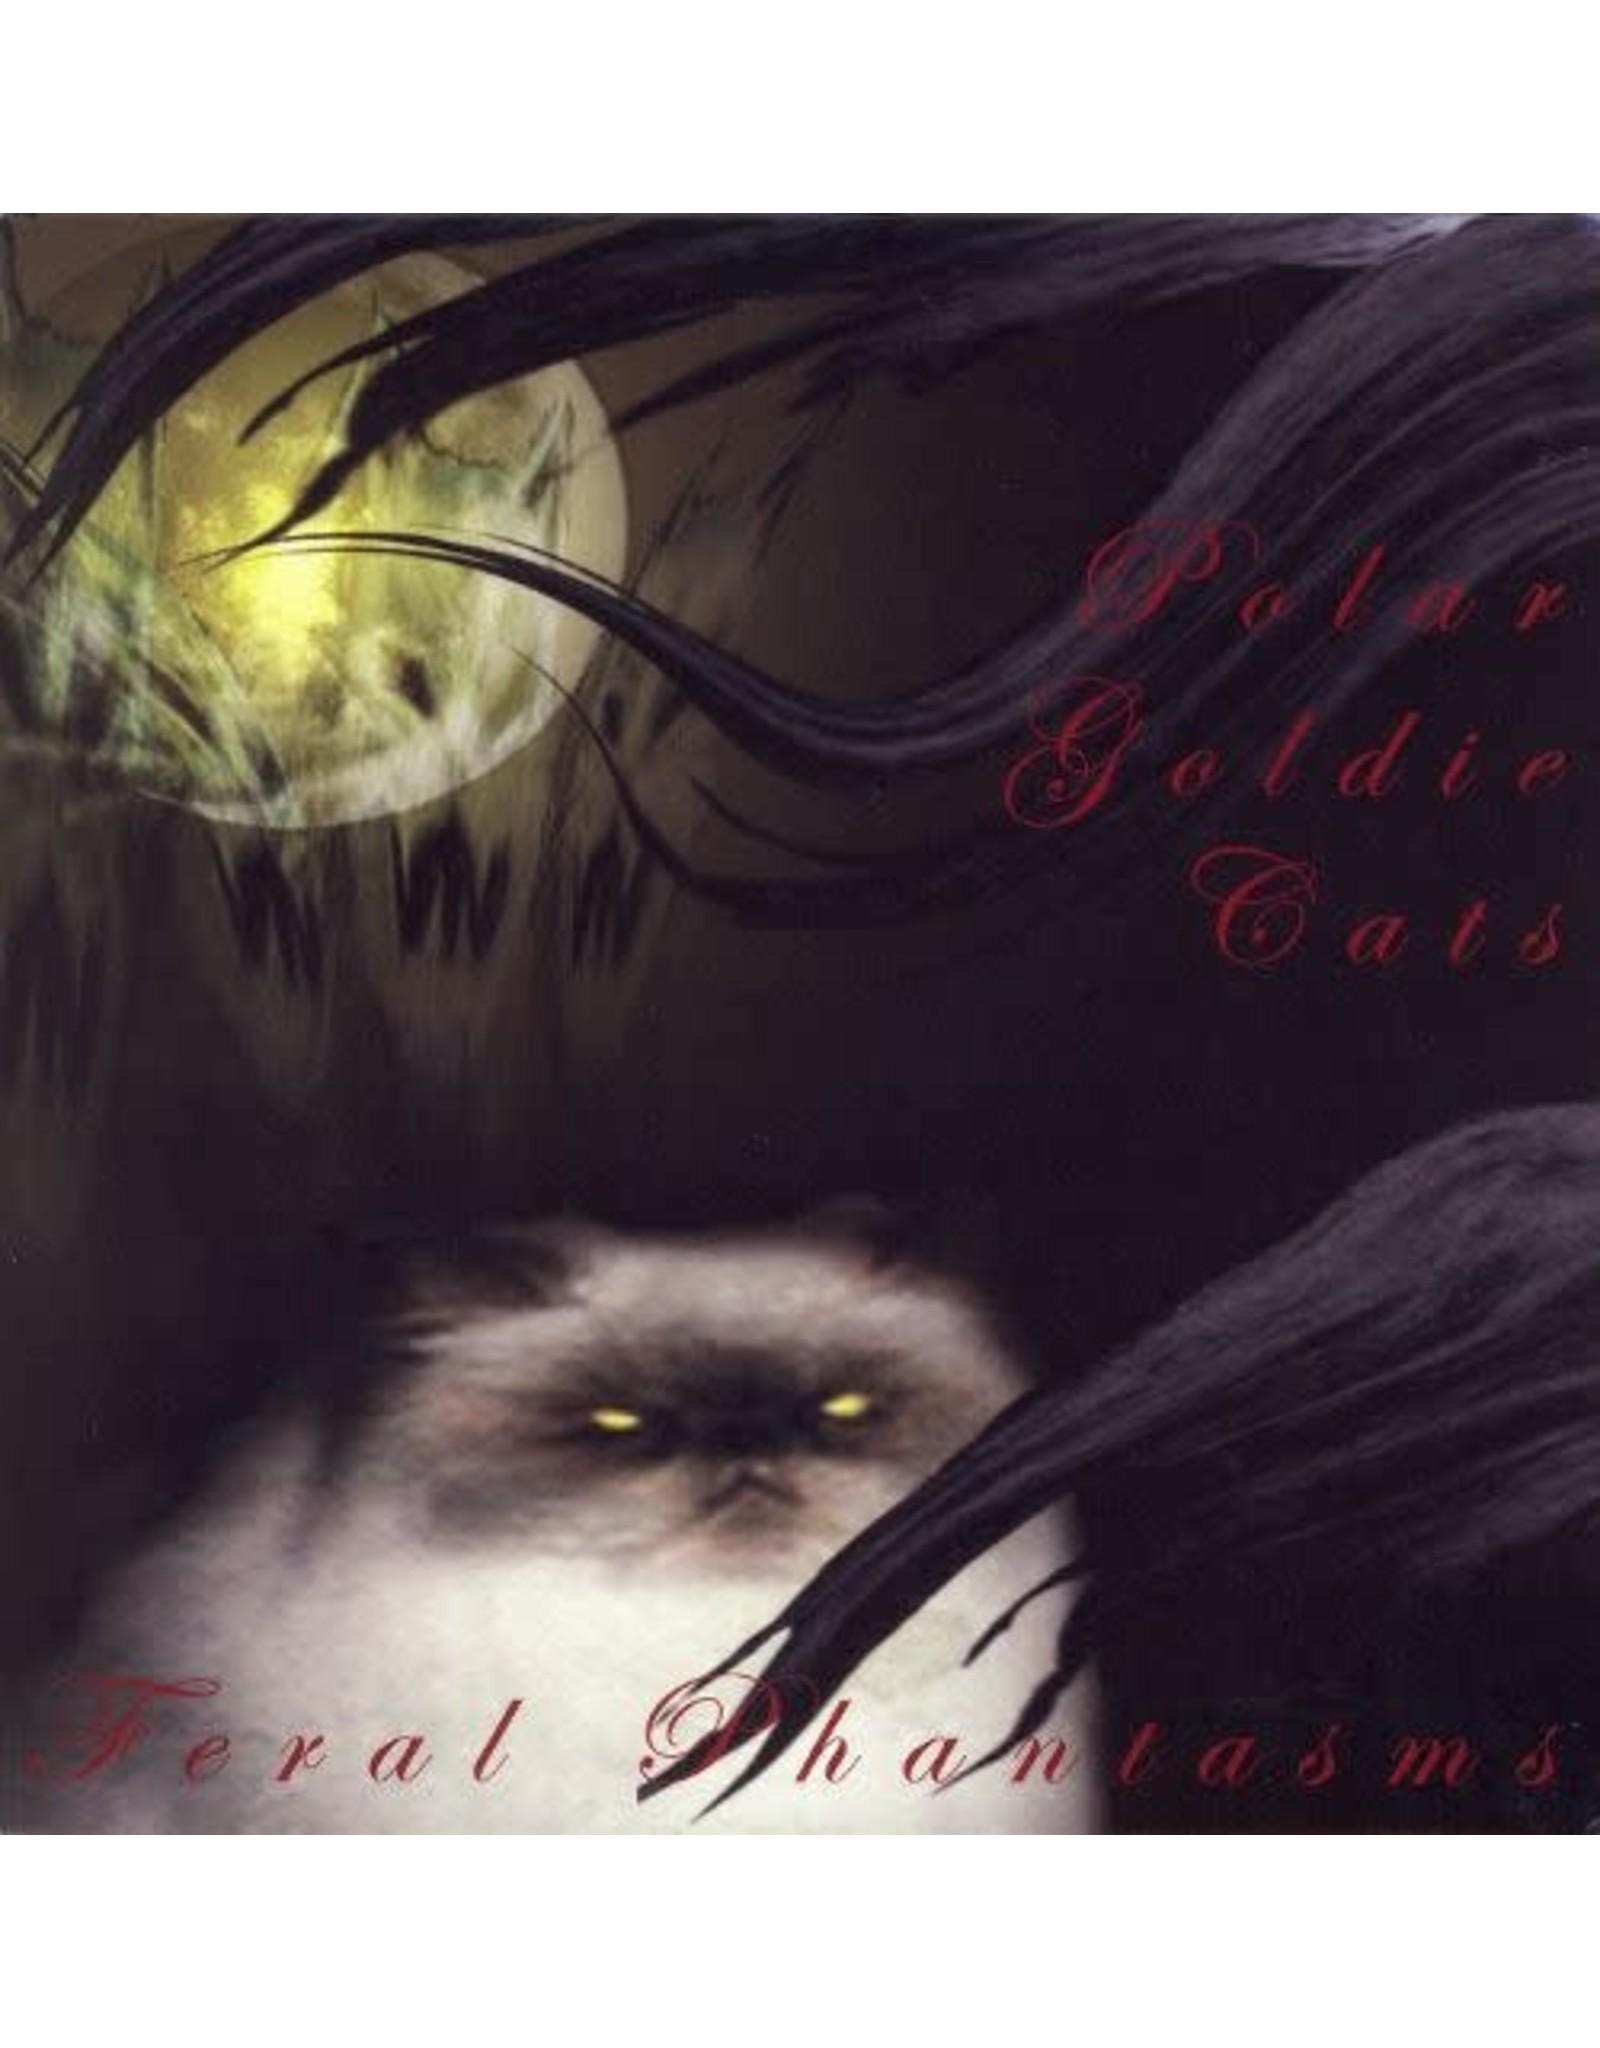 Polar Goldie Cats  - Feral Phantasm CD